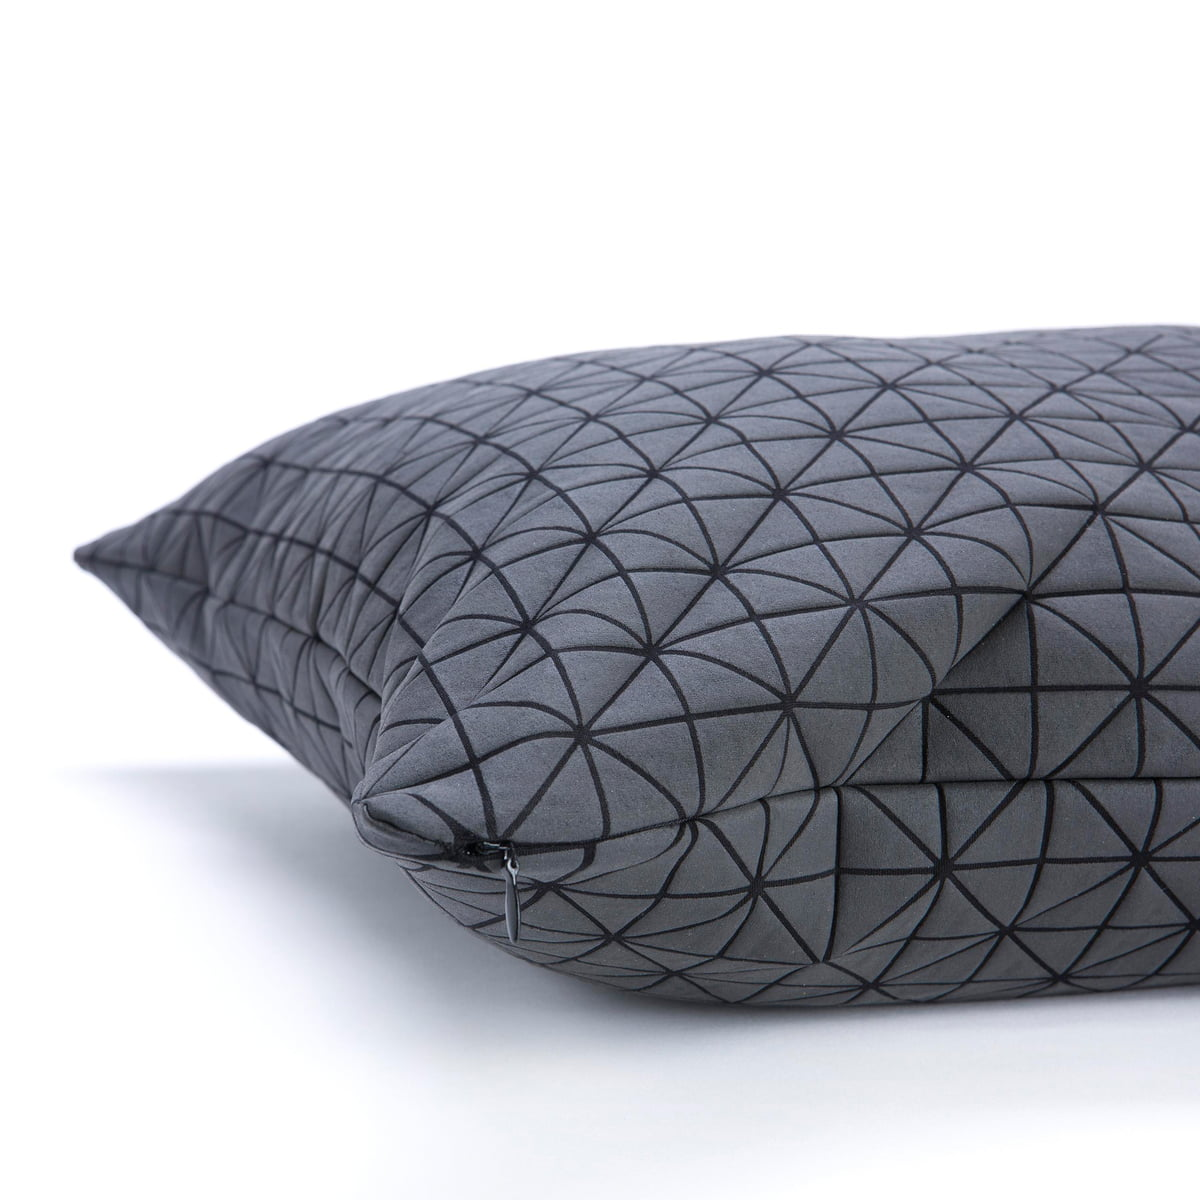 geo origami kissenbezug von mika barr. Black Bedroom Furniture Sets. Home Design Ideas